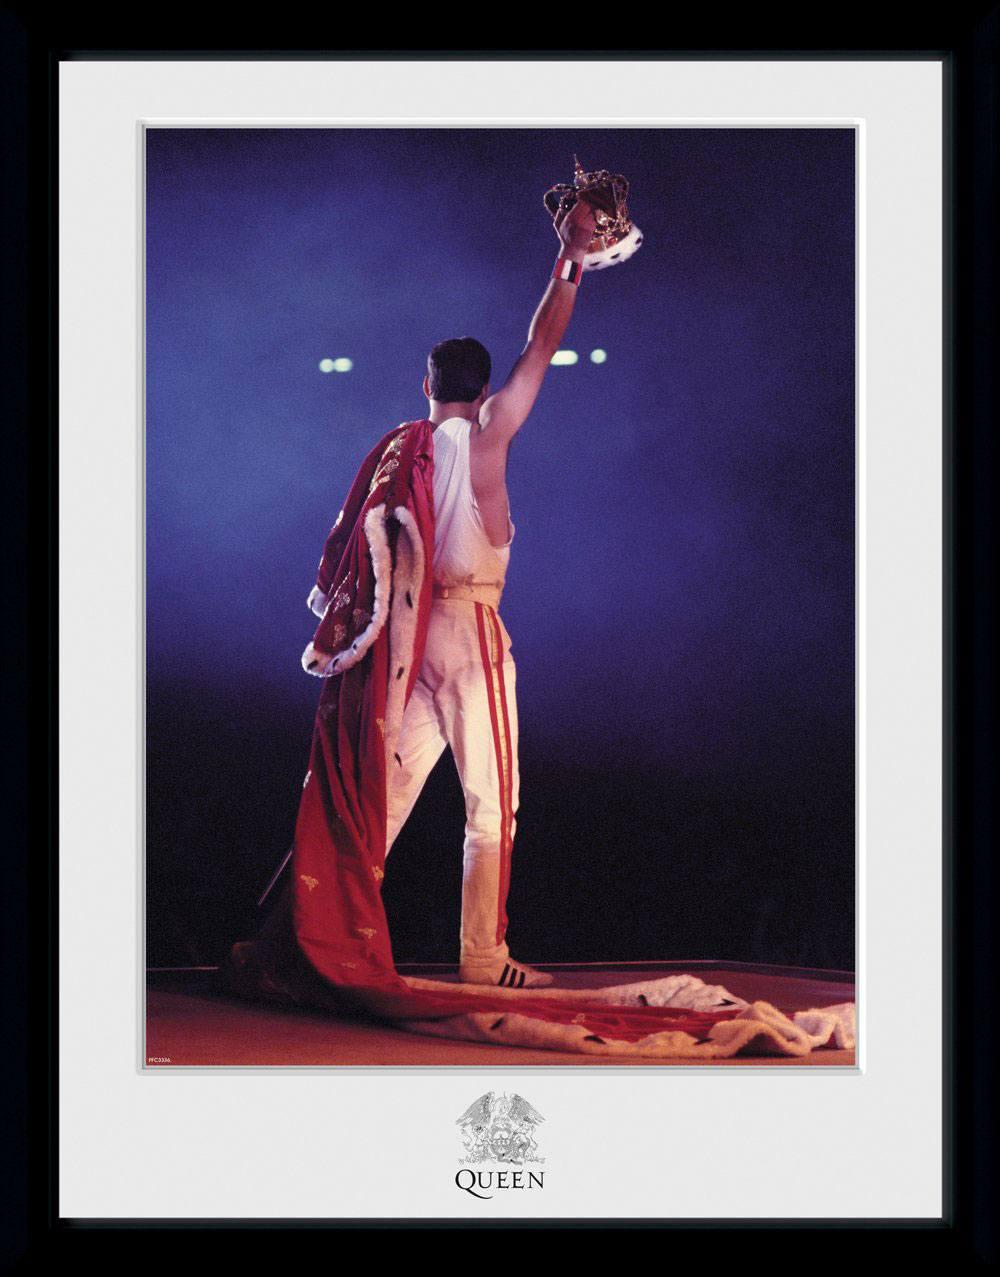 Queen Framed Poster Crown (Bravado) 45 x 34 cm